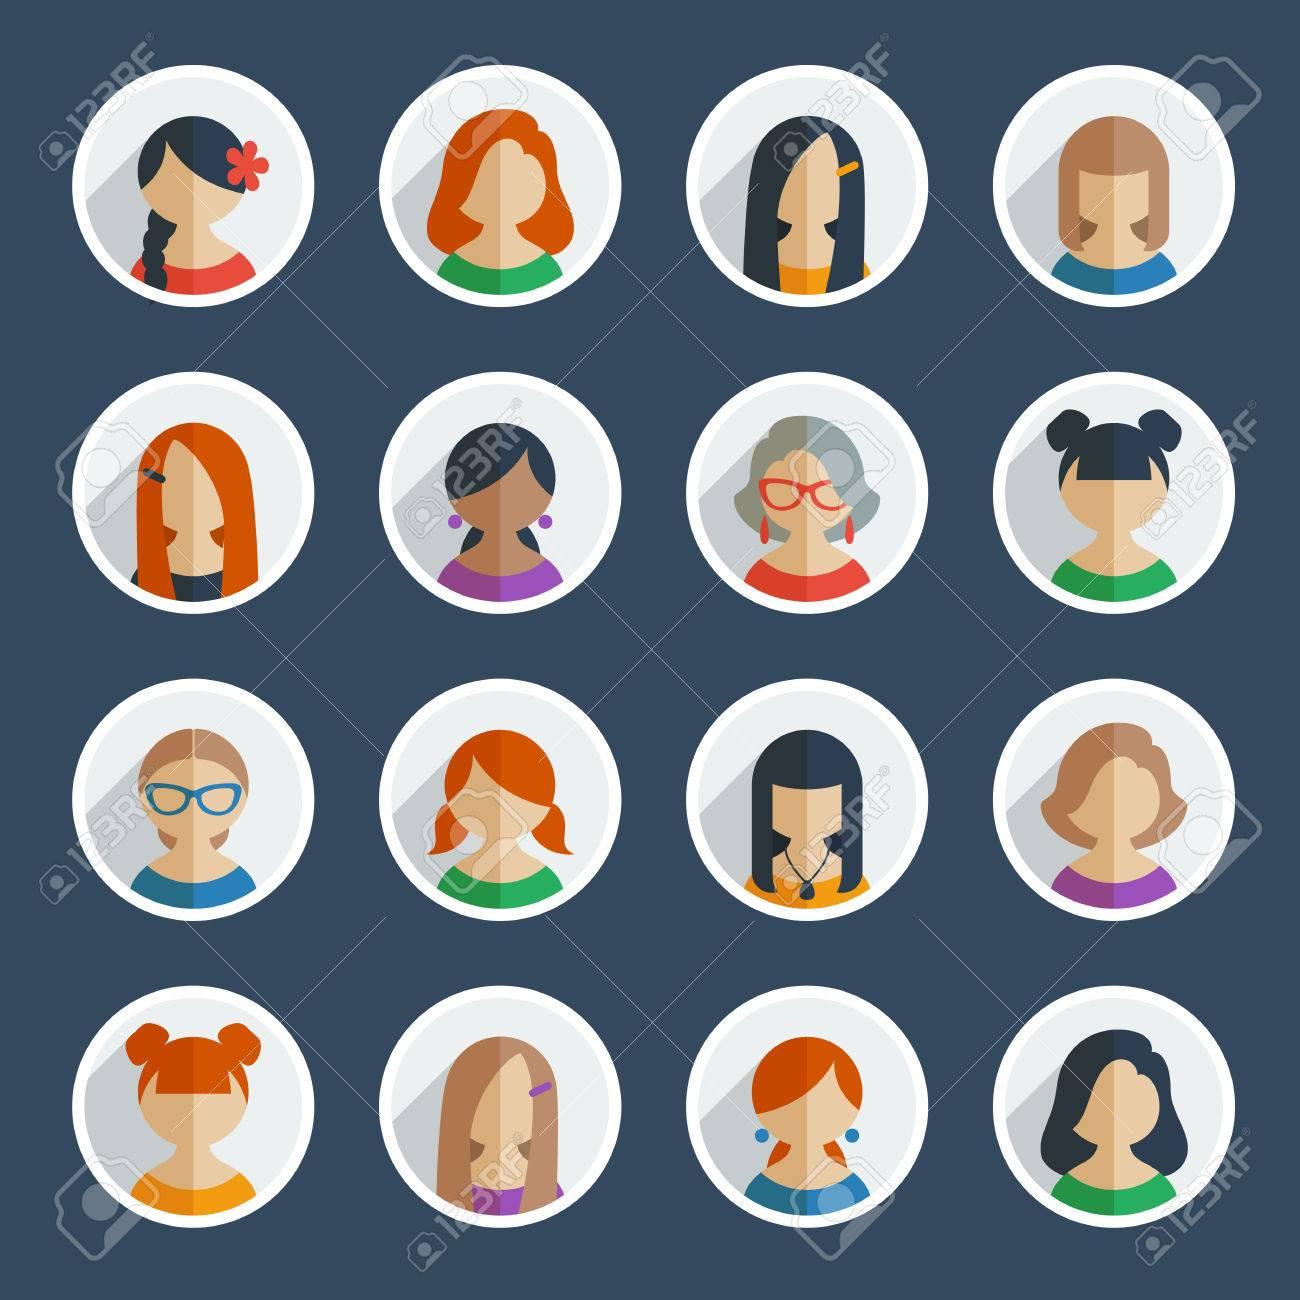 Free female sex avatars